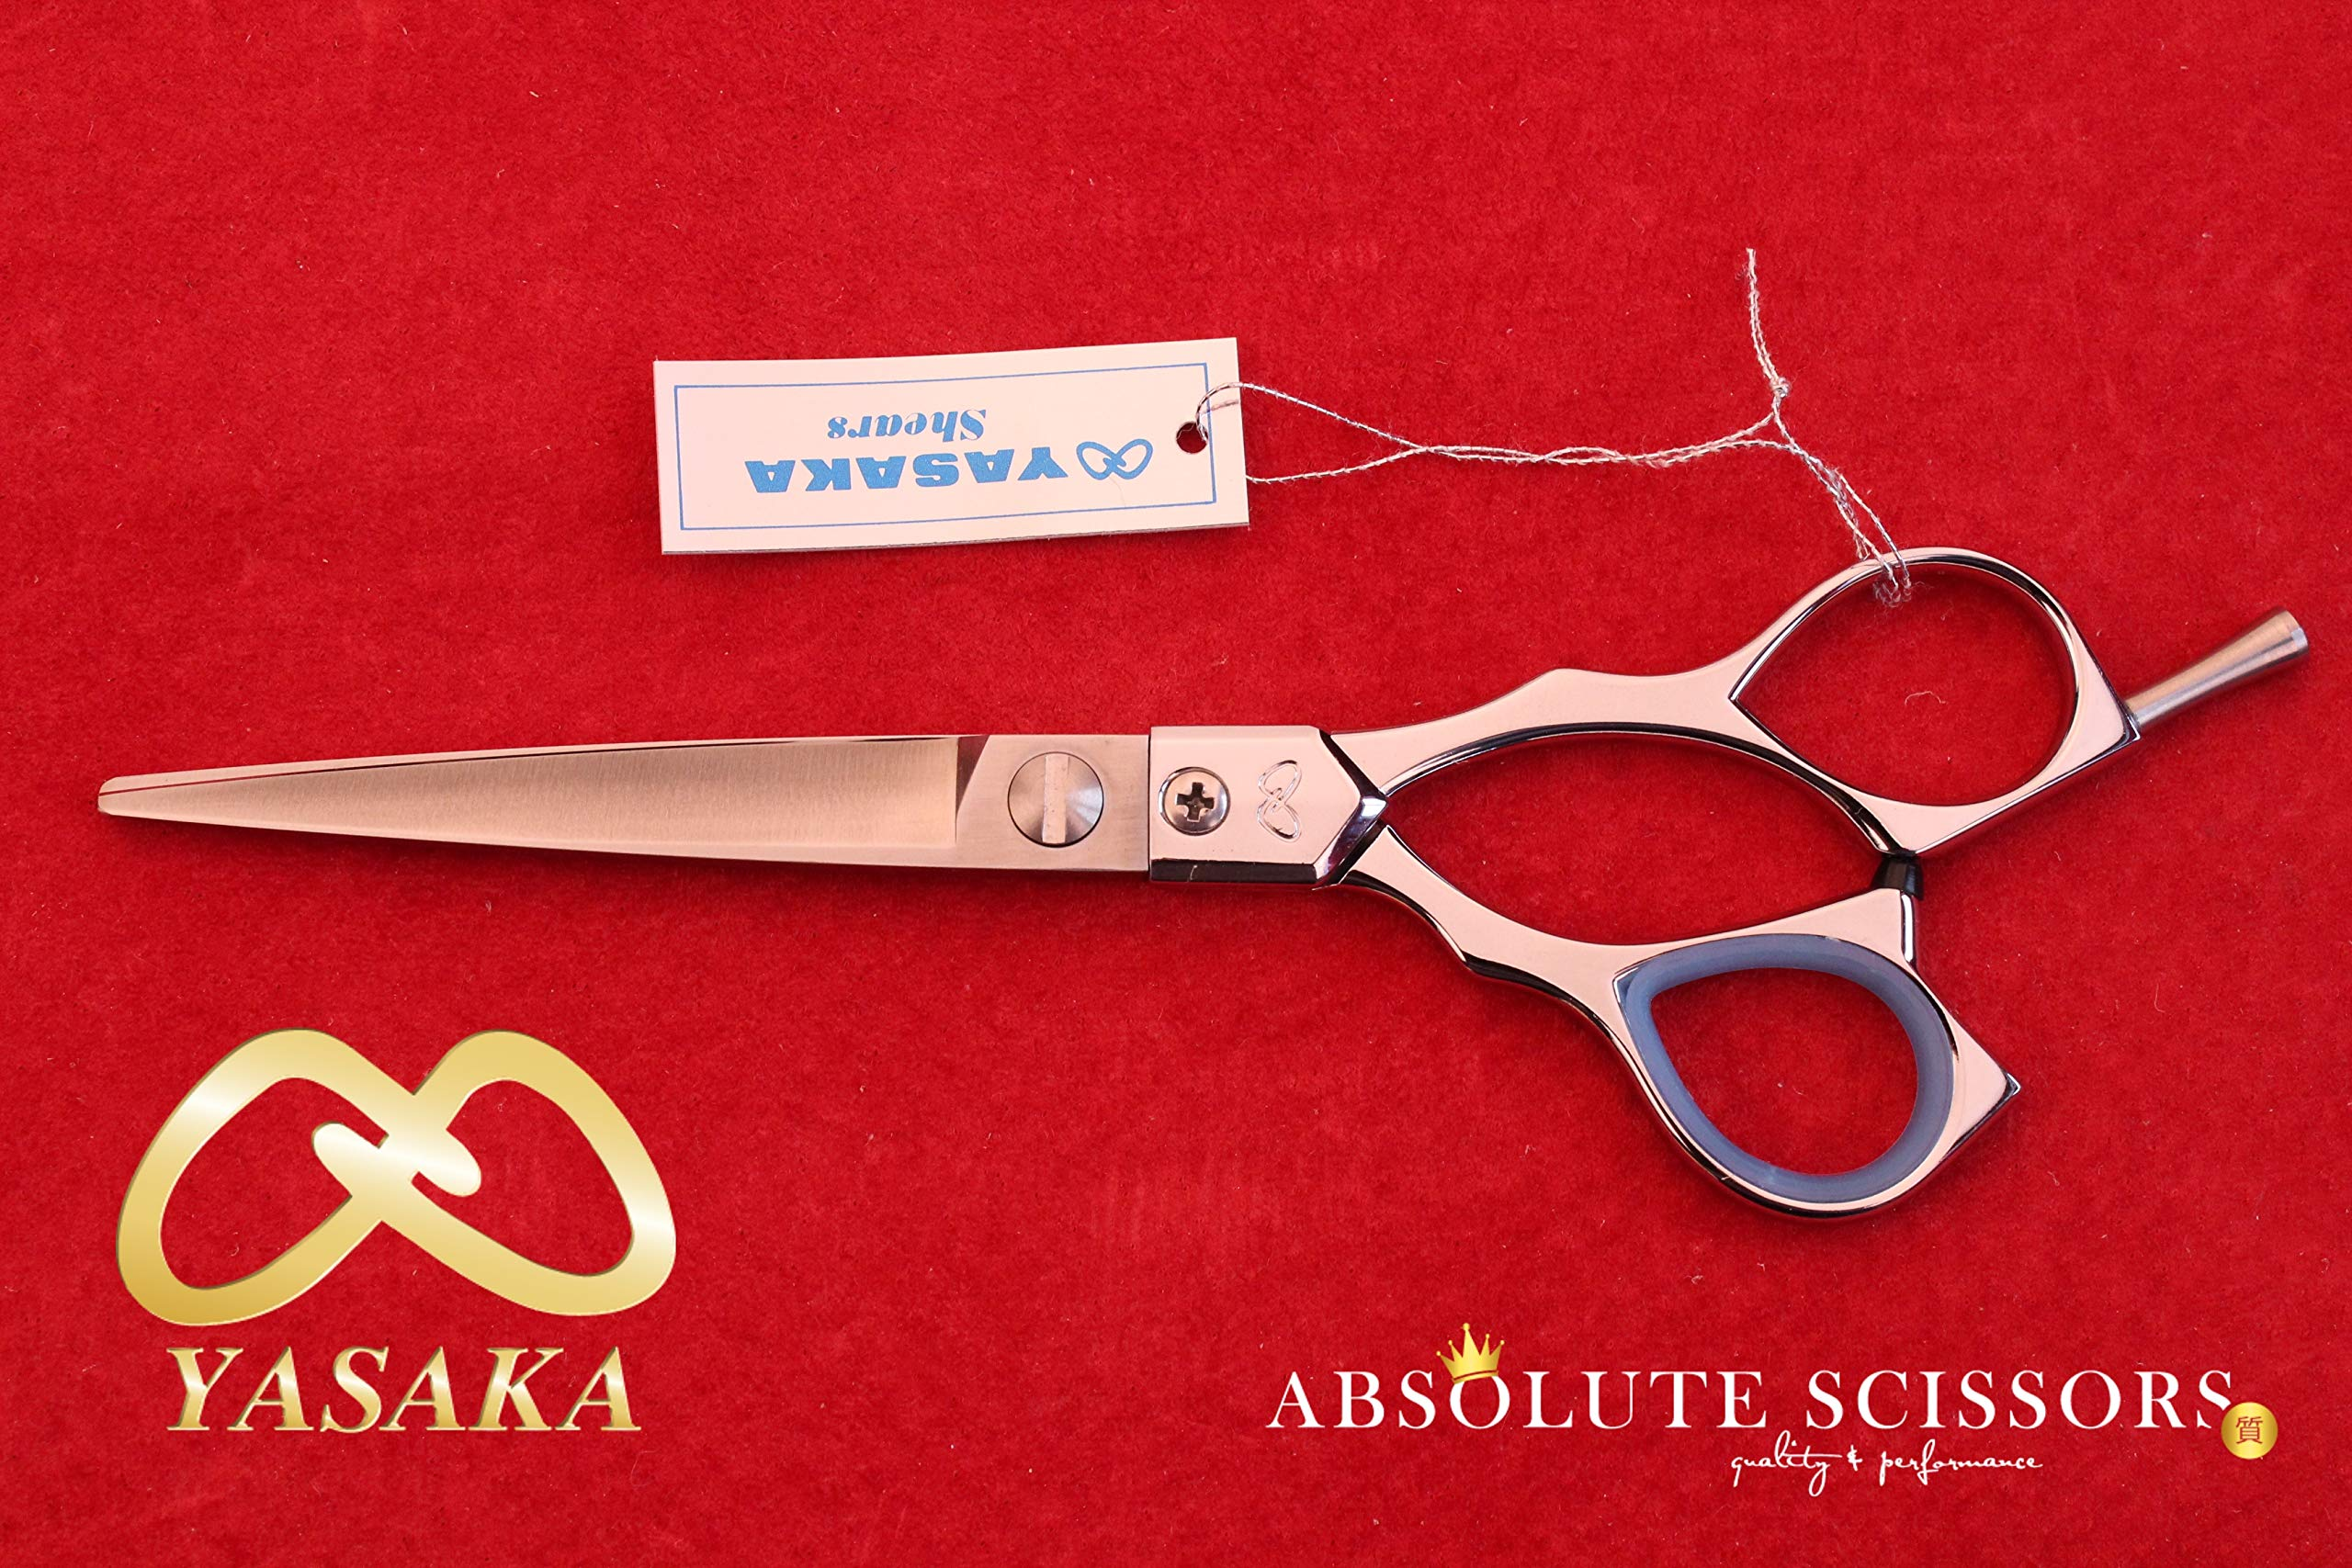 Yasaka Hair scissors-shears M600 6 inches COBALT ATS 314 Made in JAPAN (FLAT SCREW)